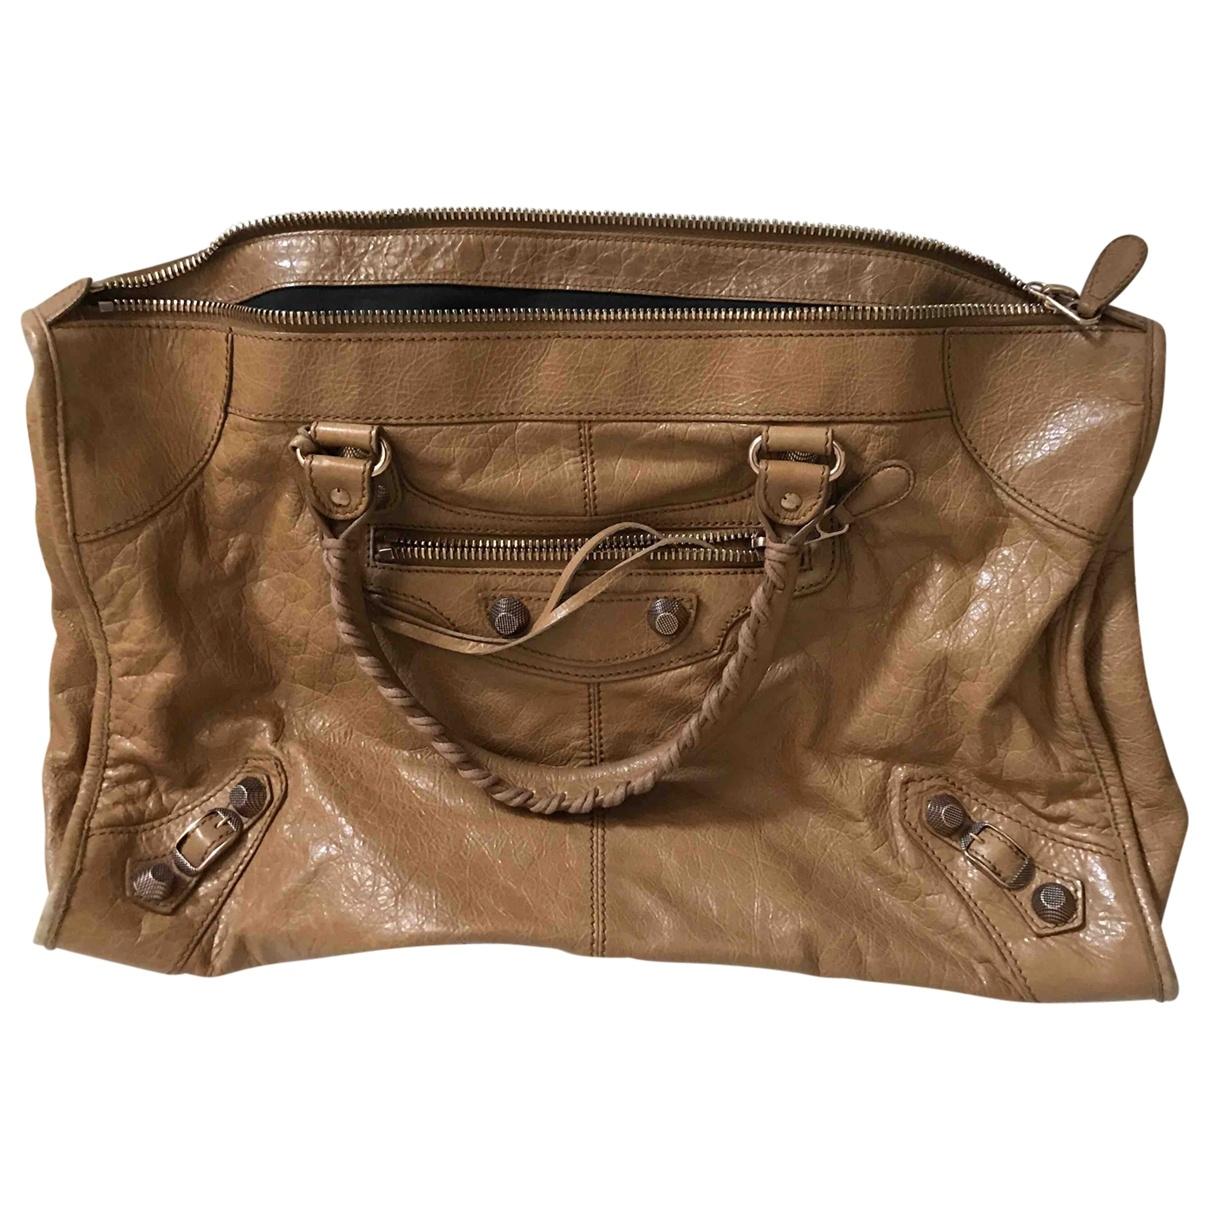 Balenciaga - Sac a main Work pour femme en cuir - marron